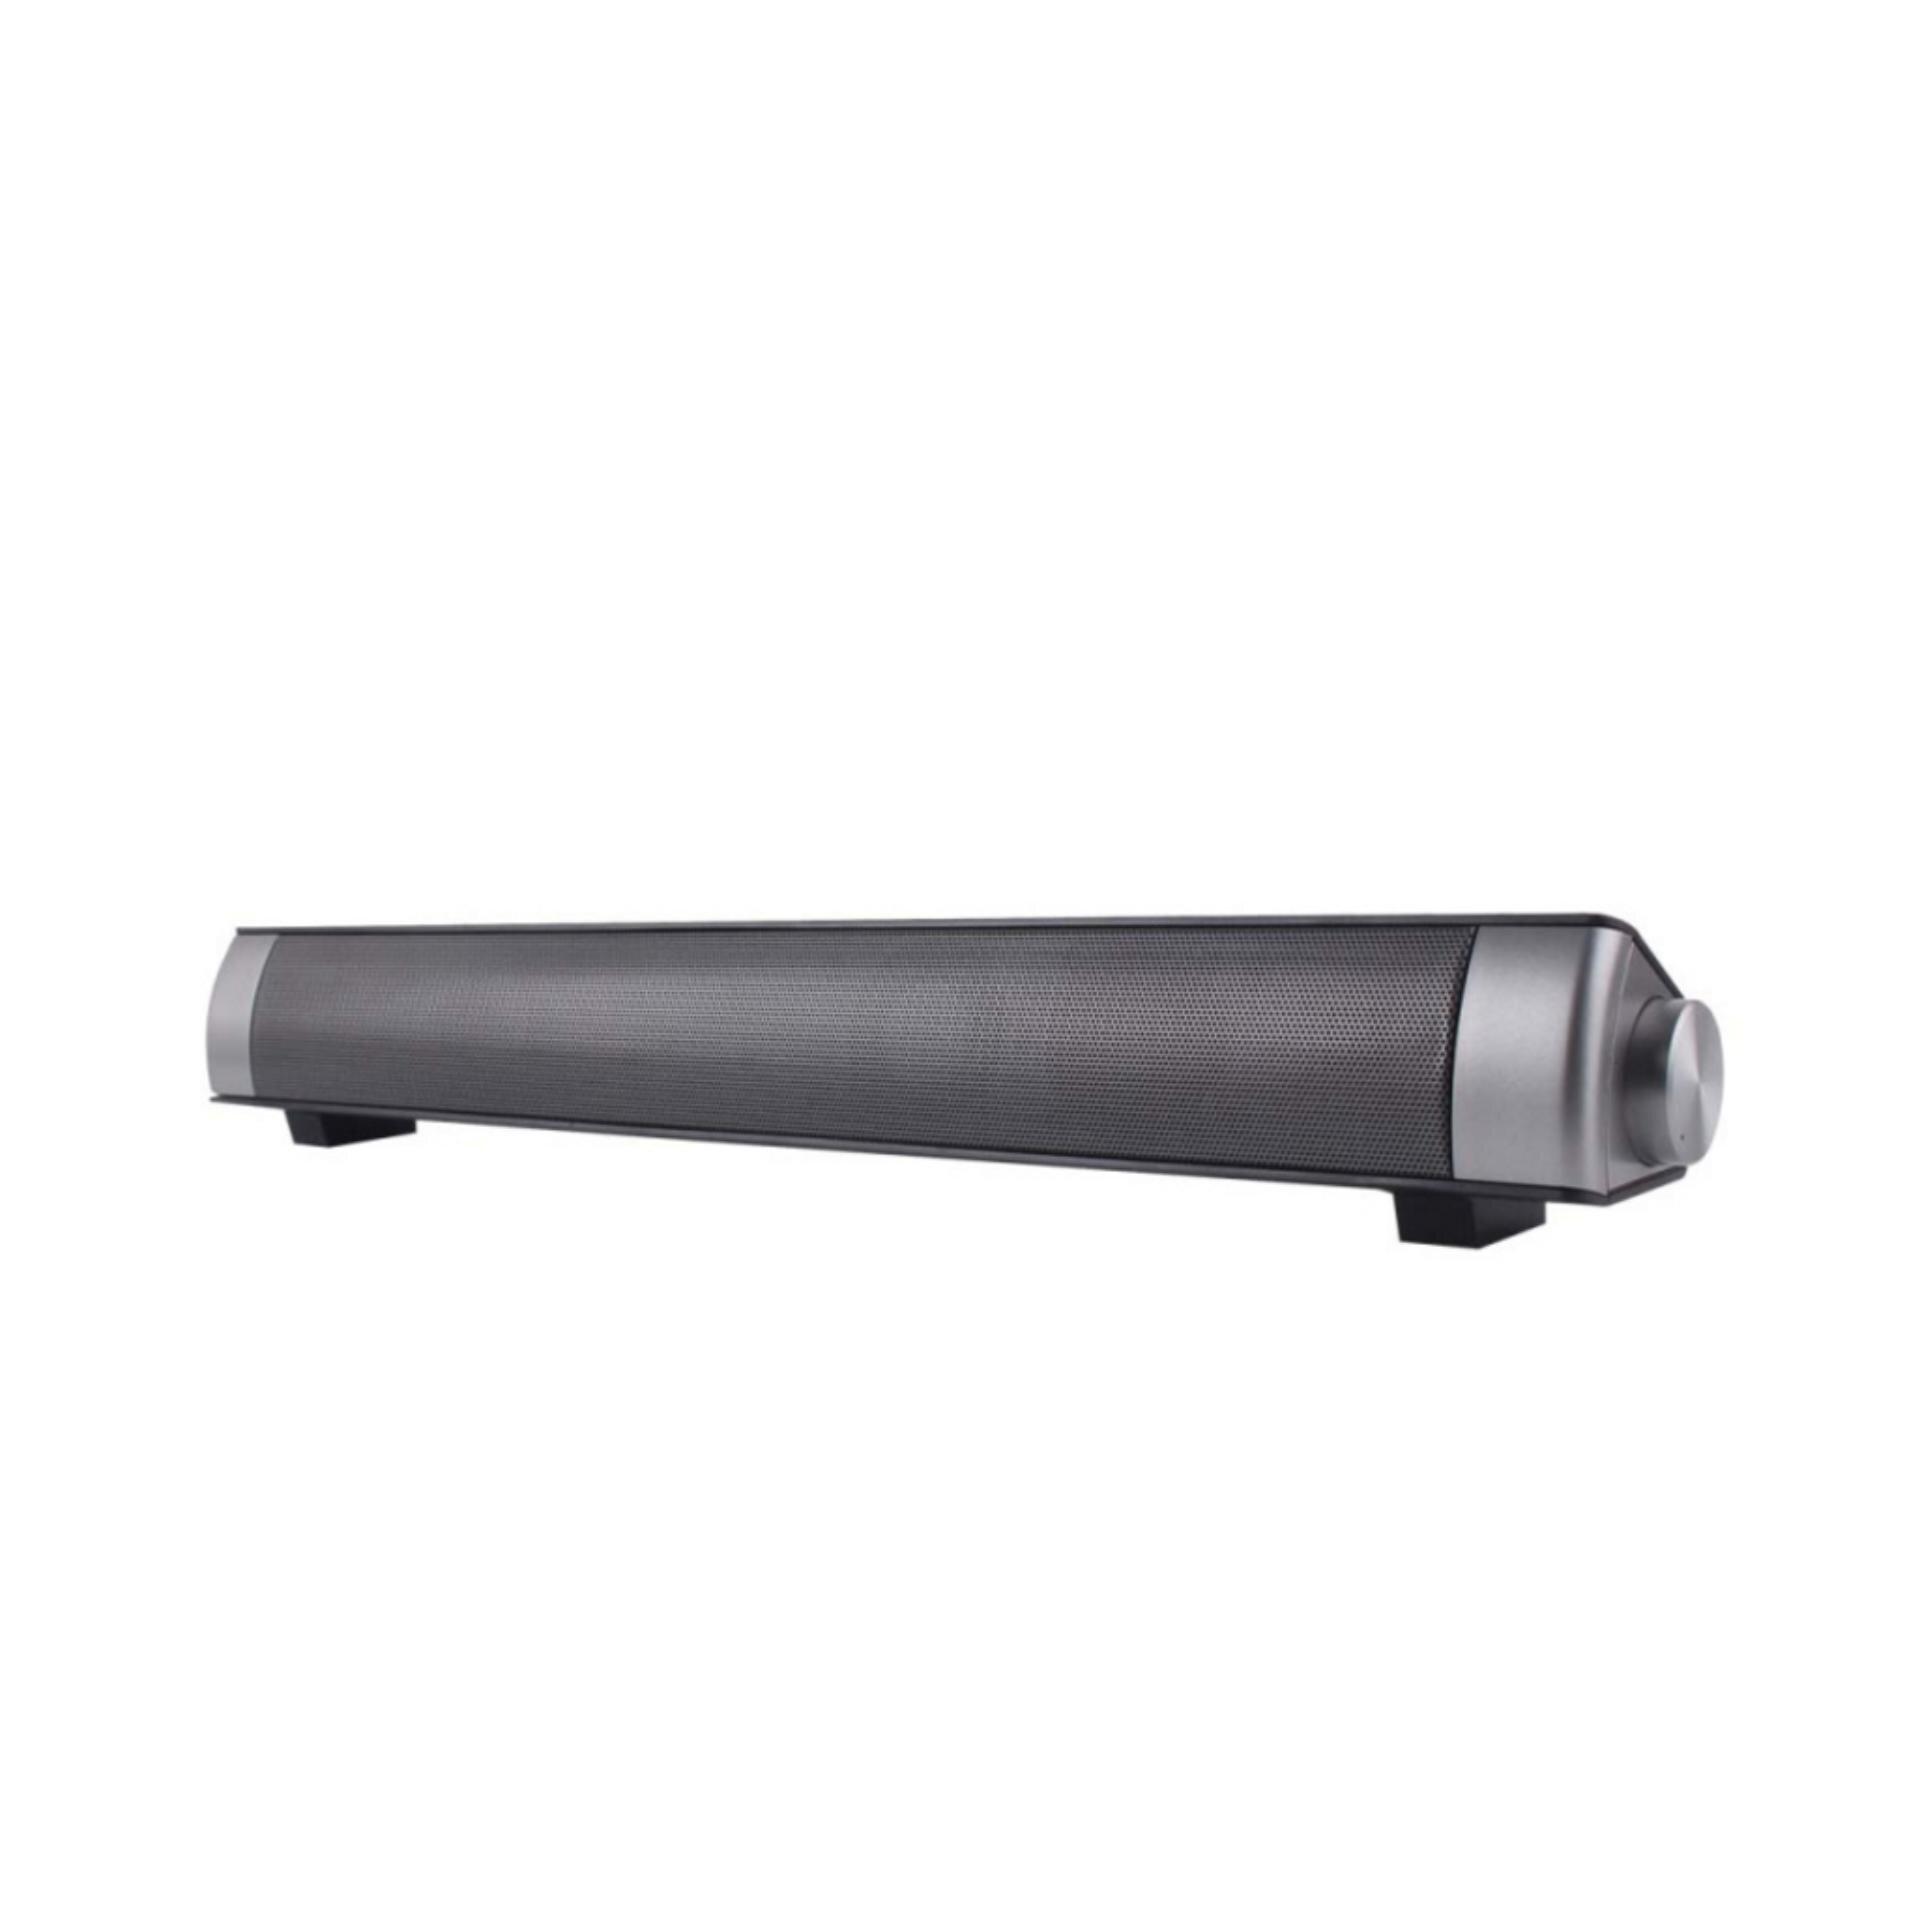 Loa siêu trầm cao cấp Sound bar Brilliant IP-08